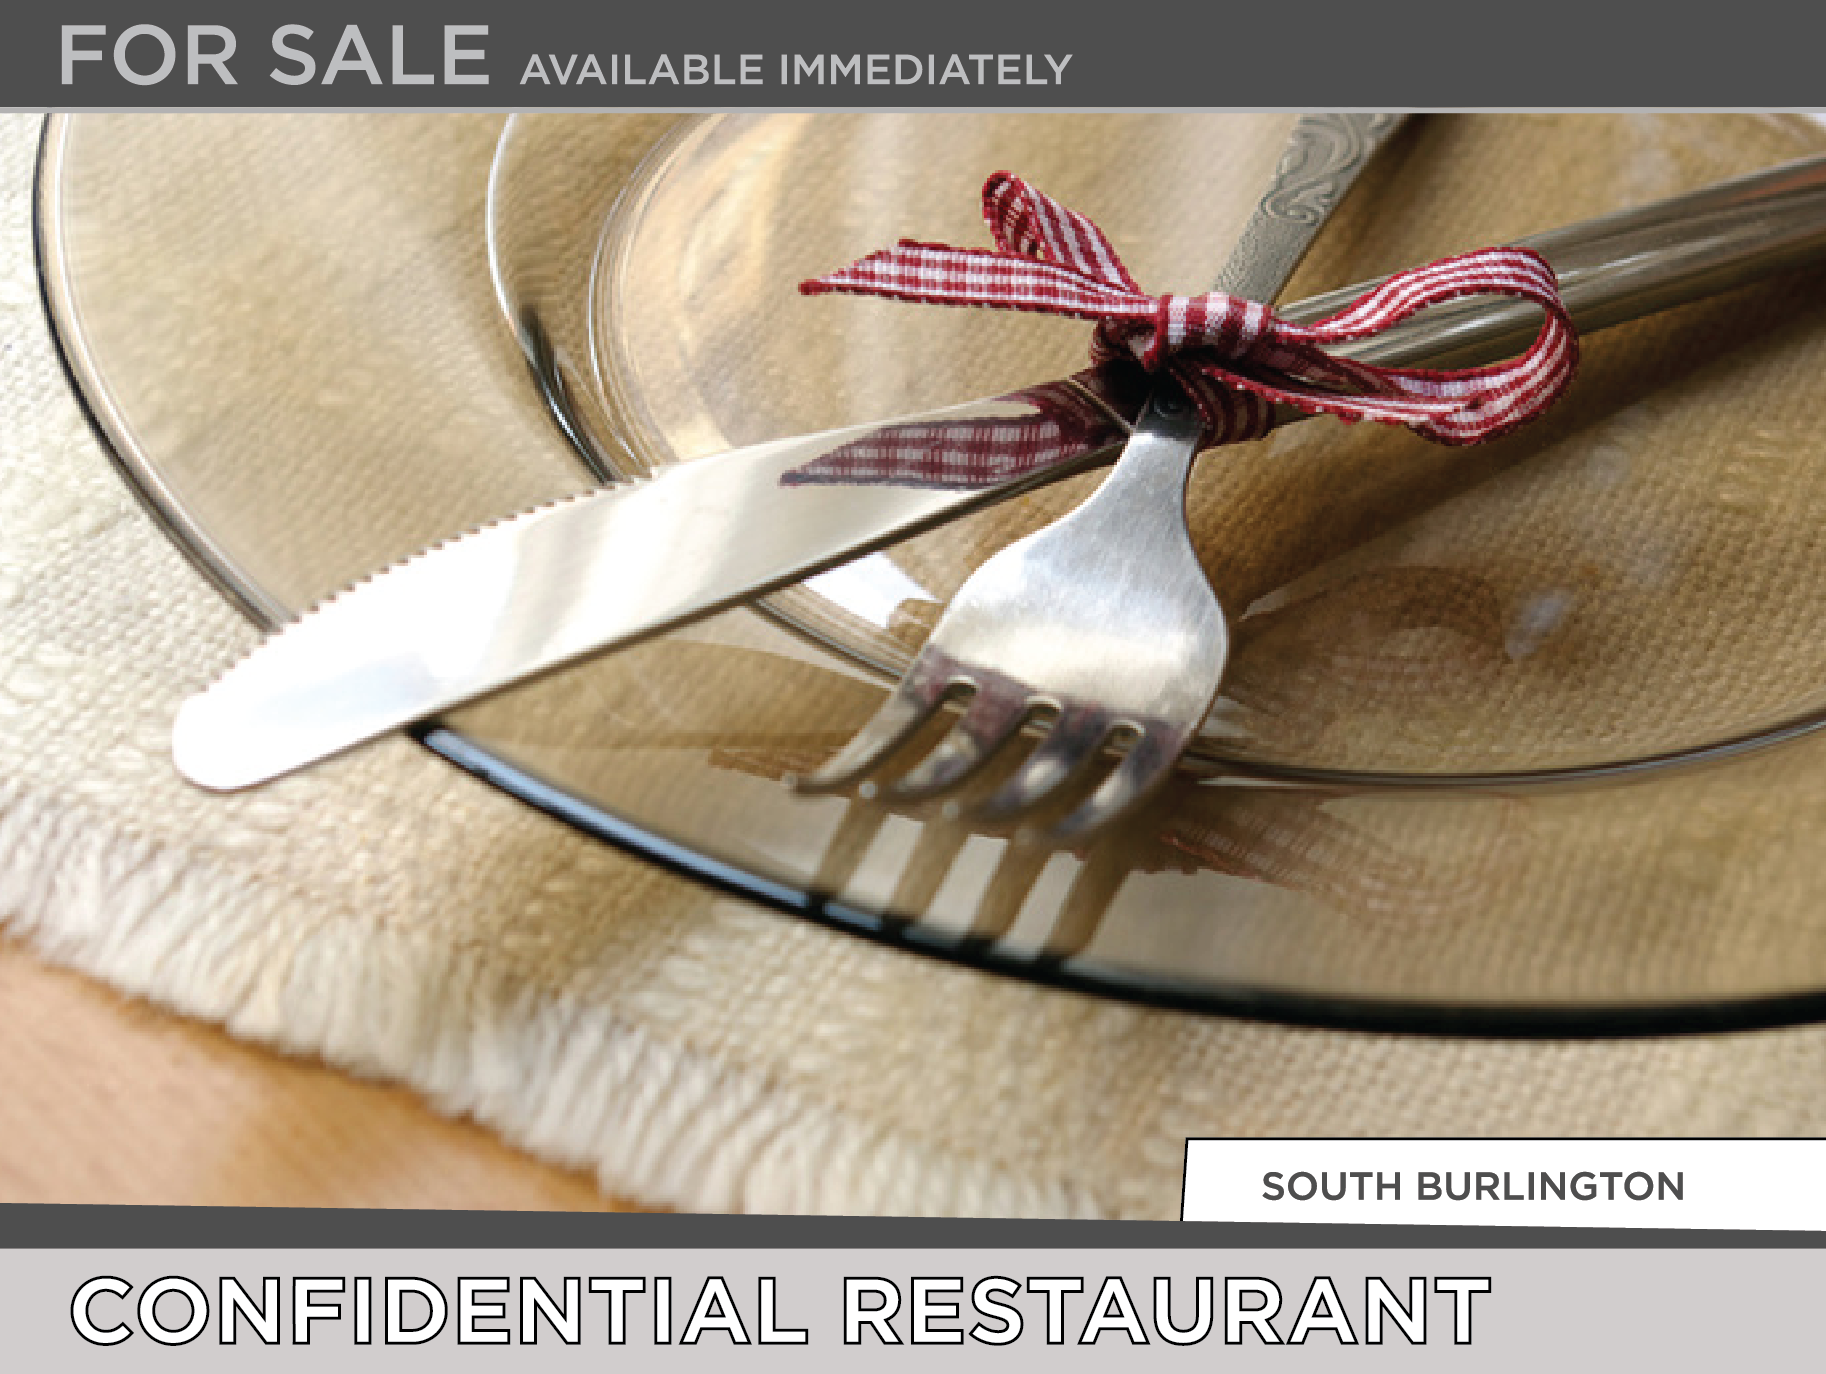 Confidential Restaurant South Burlington